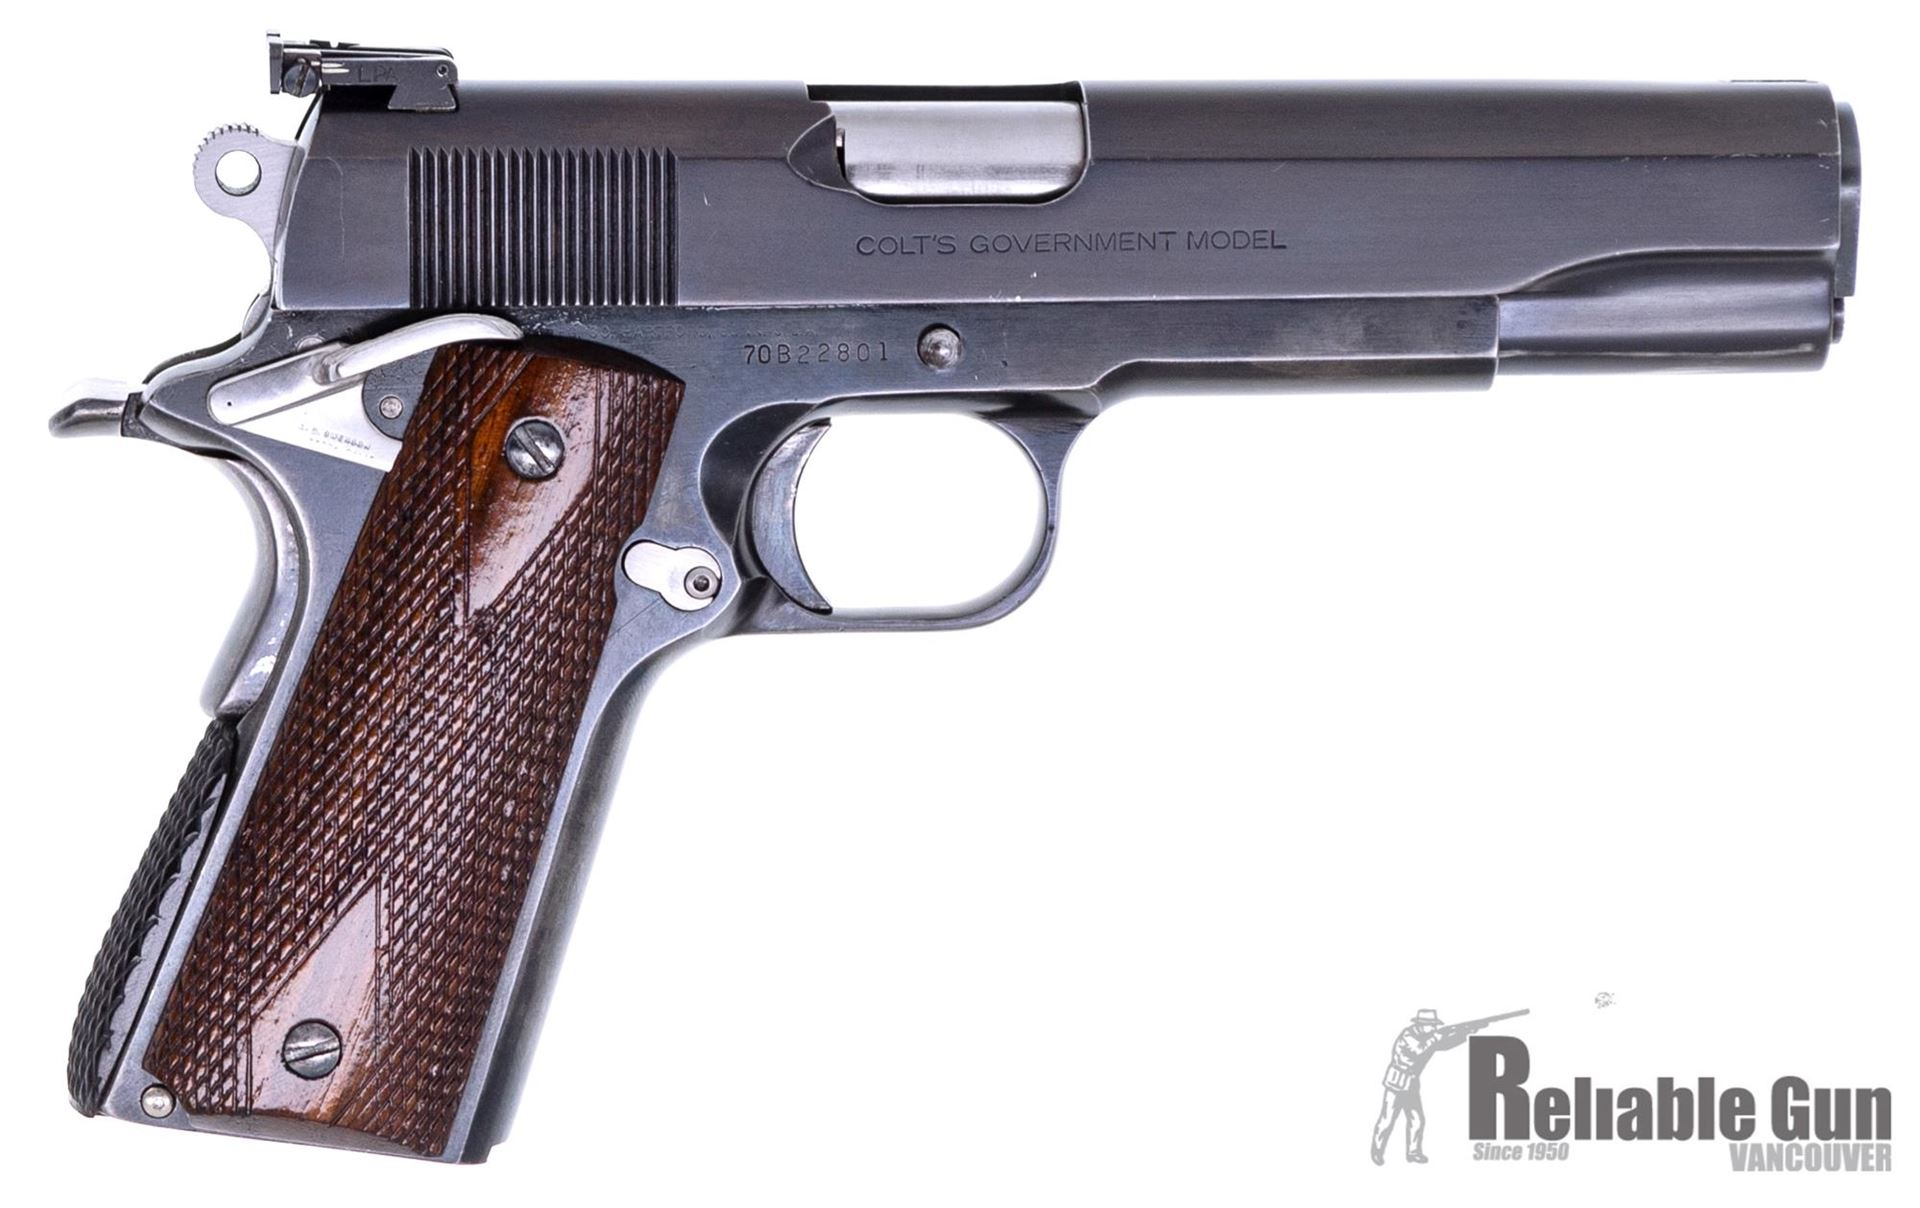 Conseil sur l'achat d'un 1911. 0044823_used-colt-1911-mk-iv-series-70-government-semi-auto-pistol-45-auto-5-blued-diamond-checkered-wood-gr